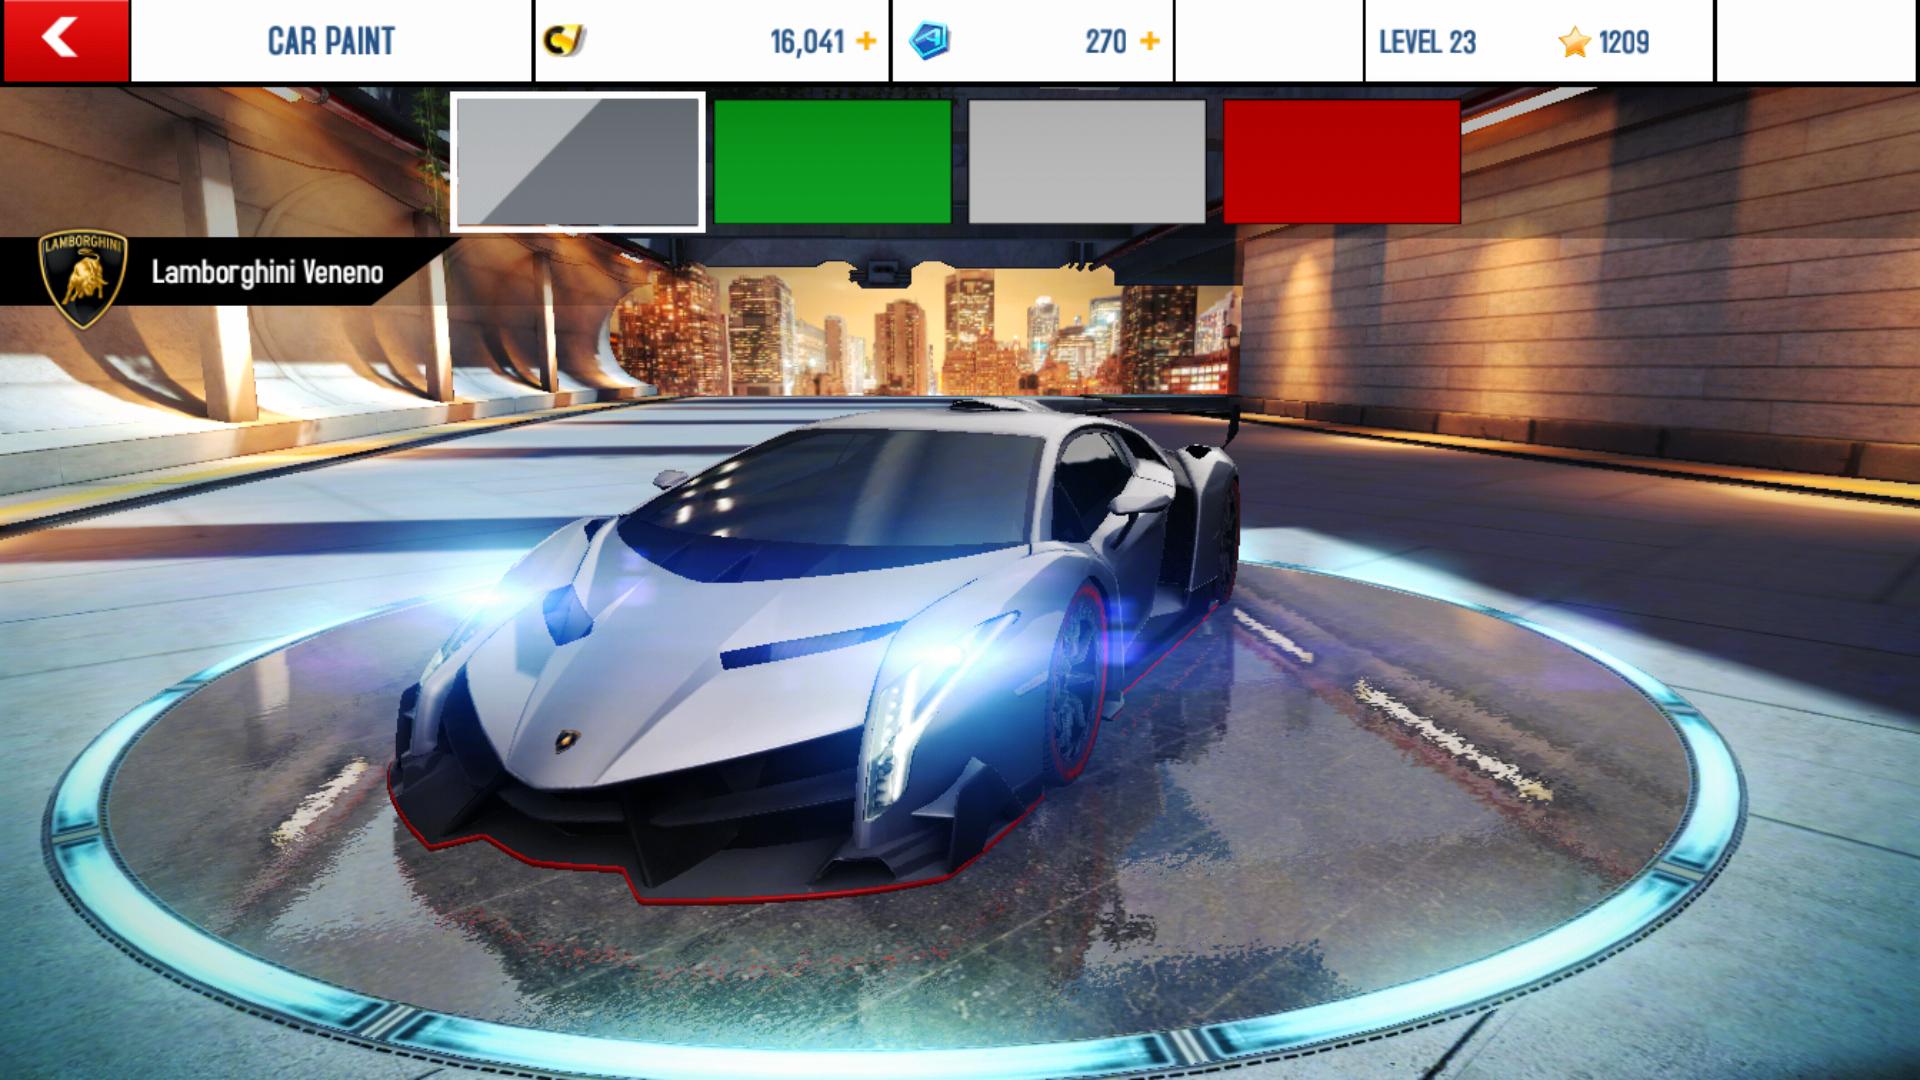 lamborghini veneno colorspng - Lamborghini Veneno Coloring Pages